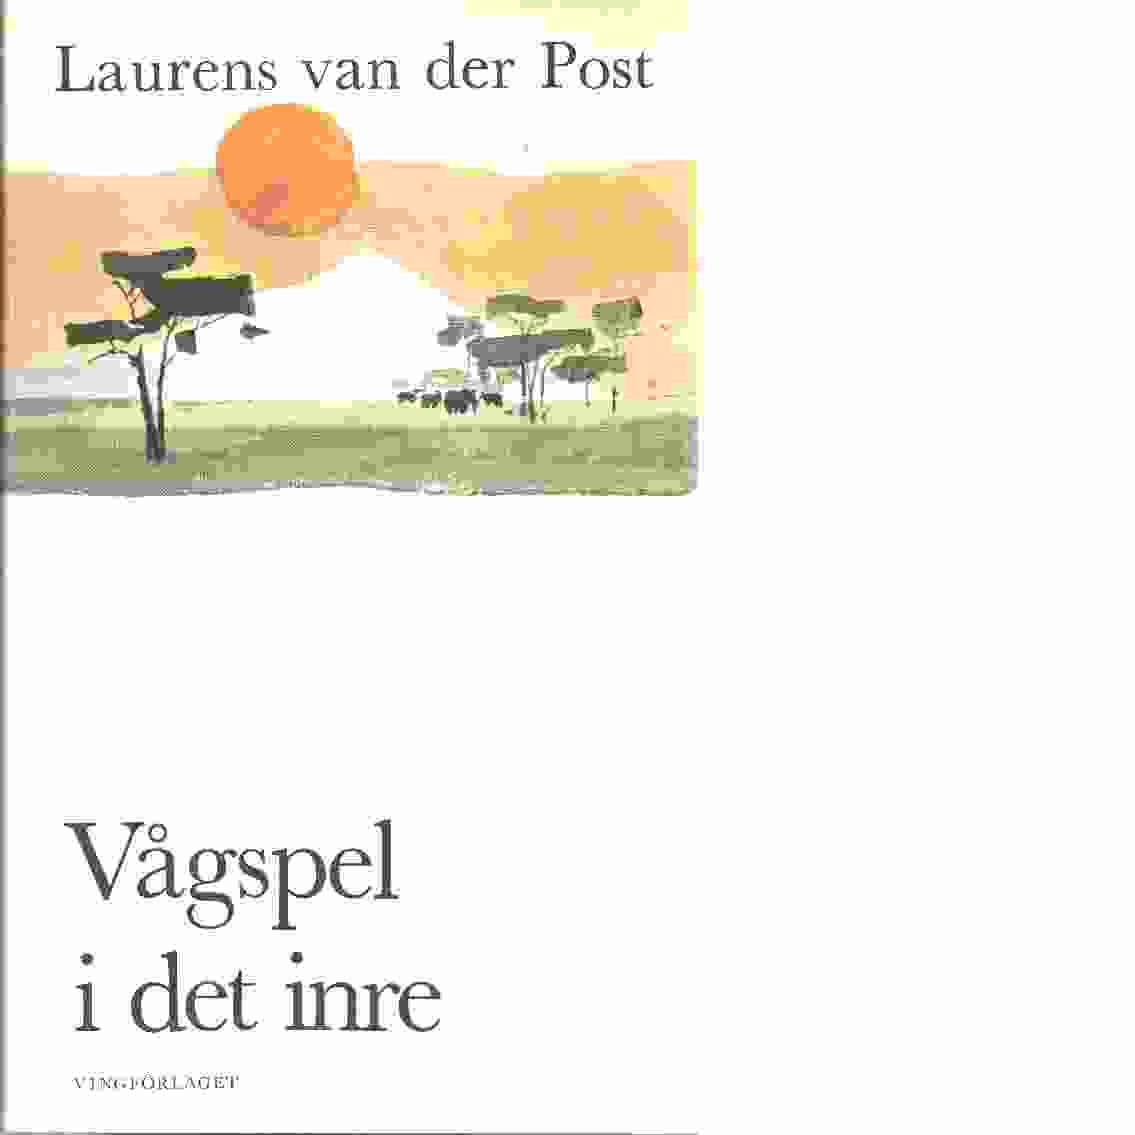 Vågspel i det inre - Van der Post, Laurens